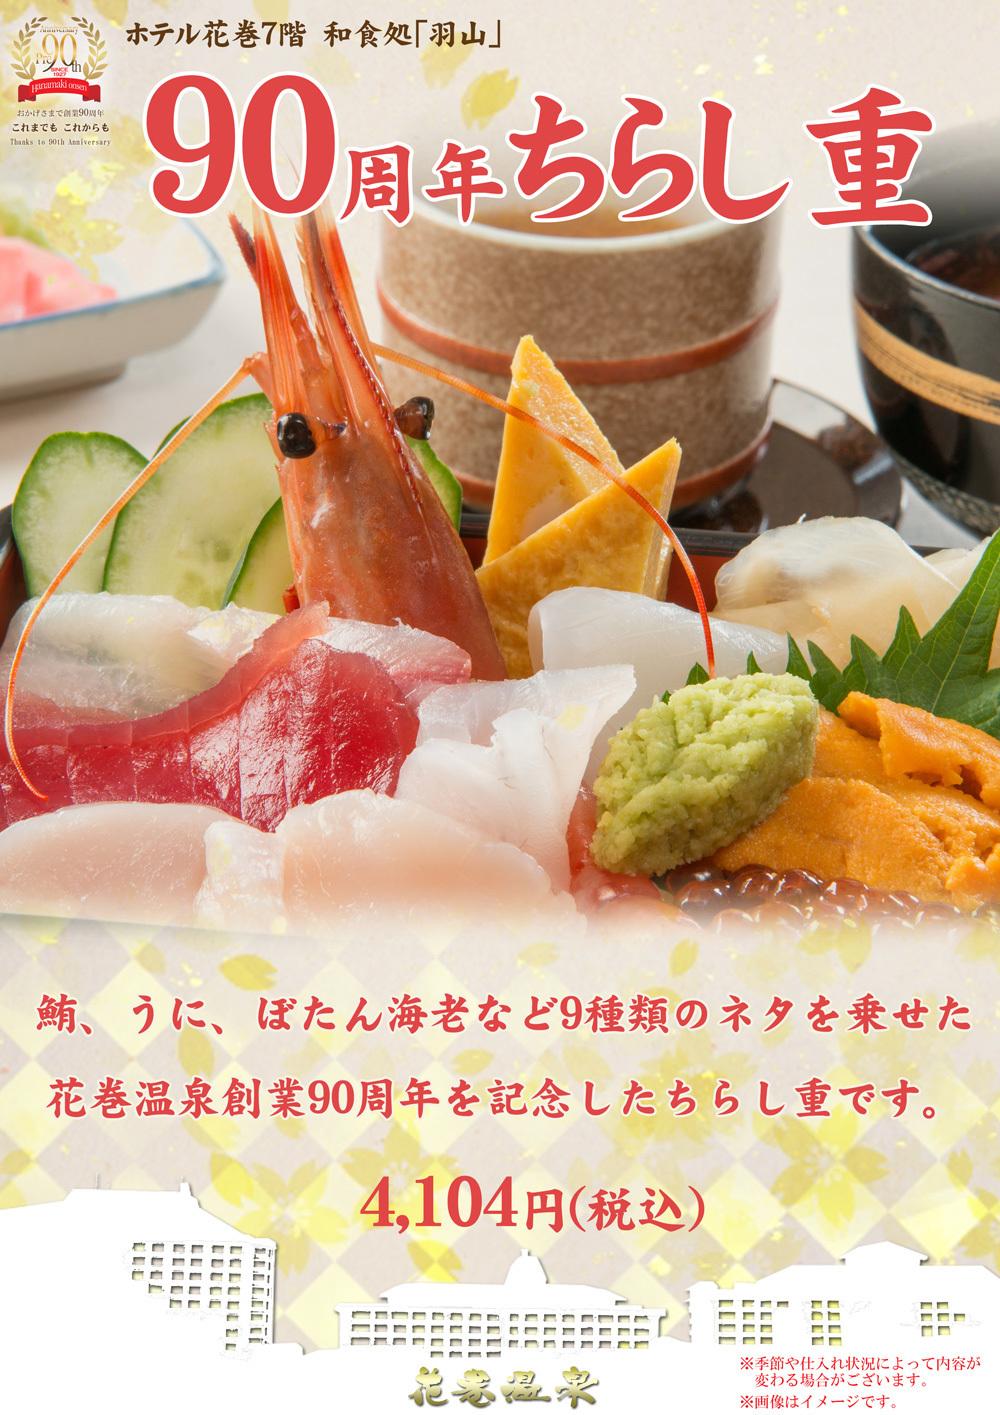 R_90周年羽山ディナー.jpg